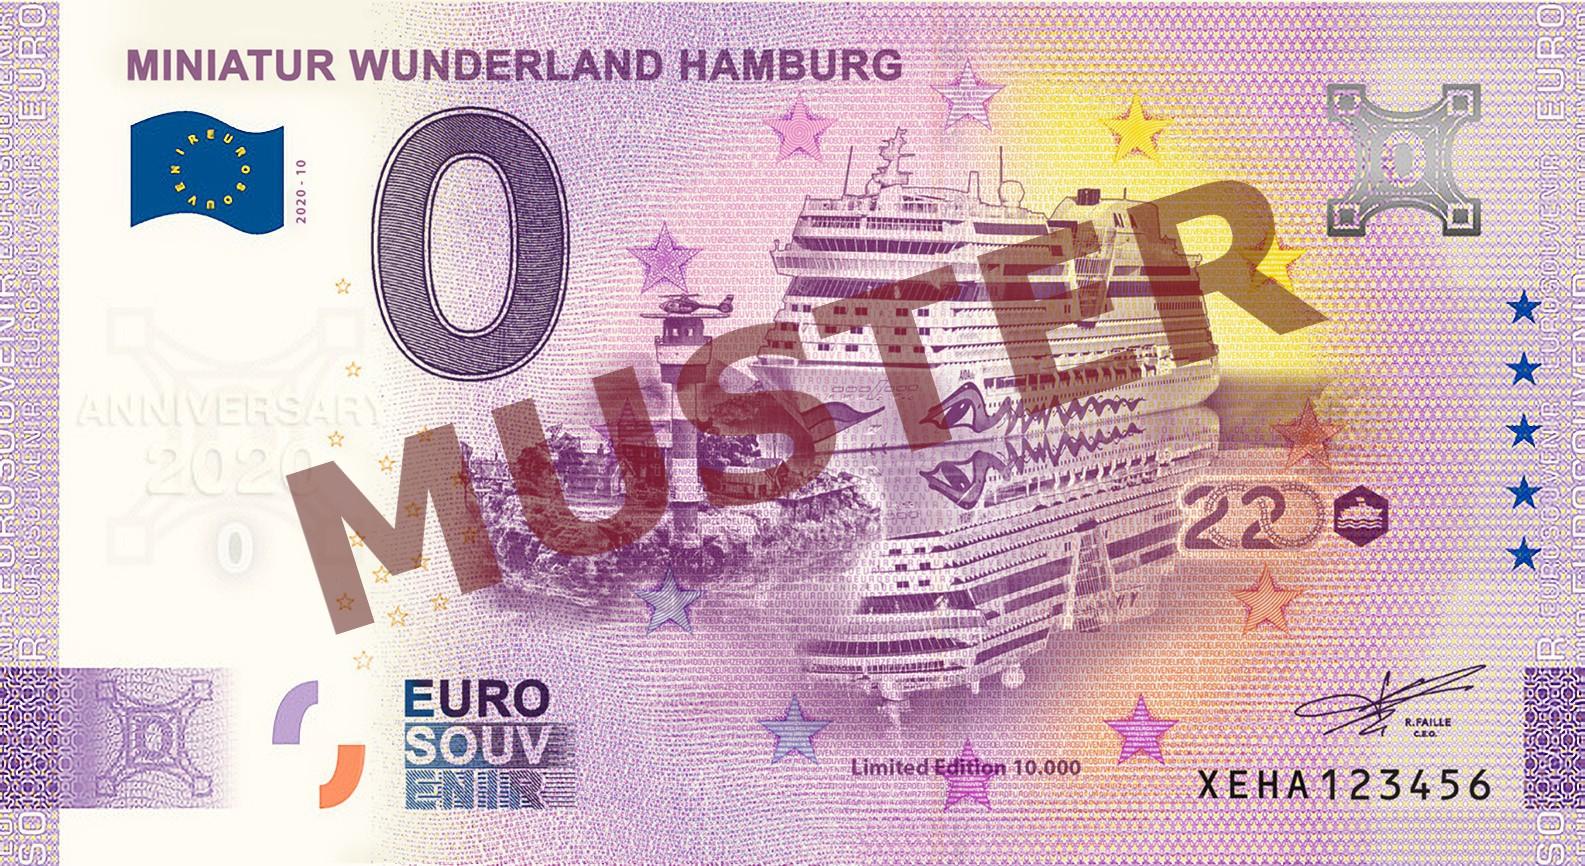 "Euro-Souvenir-Banknote Motif ""NordOstsee"" (2020-10.2) Anniversary-Edition"